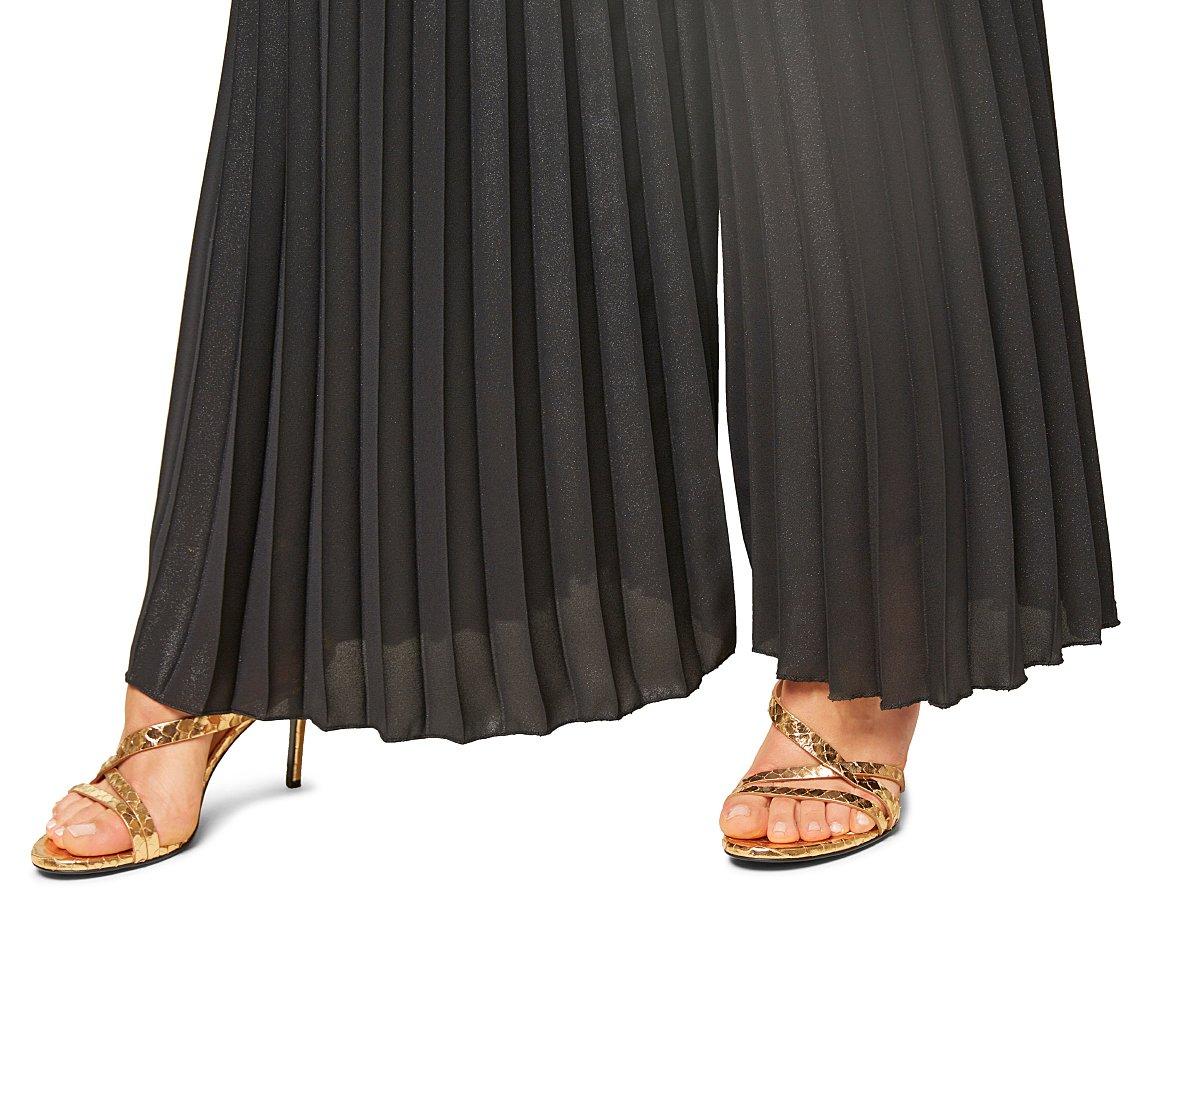 Pantaloni a vita alta in tessuto